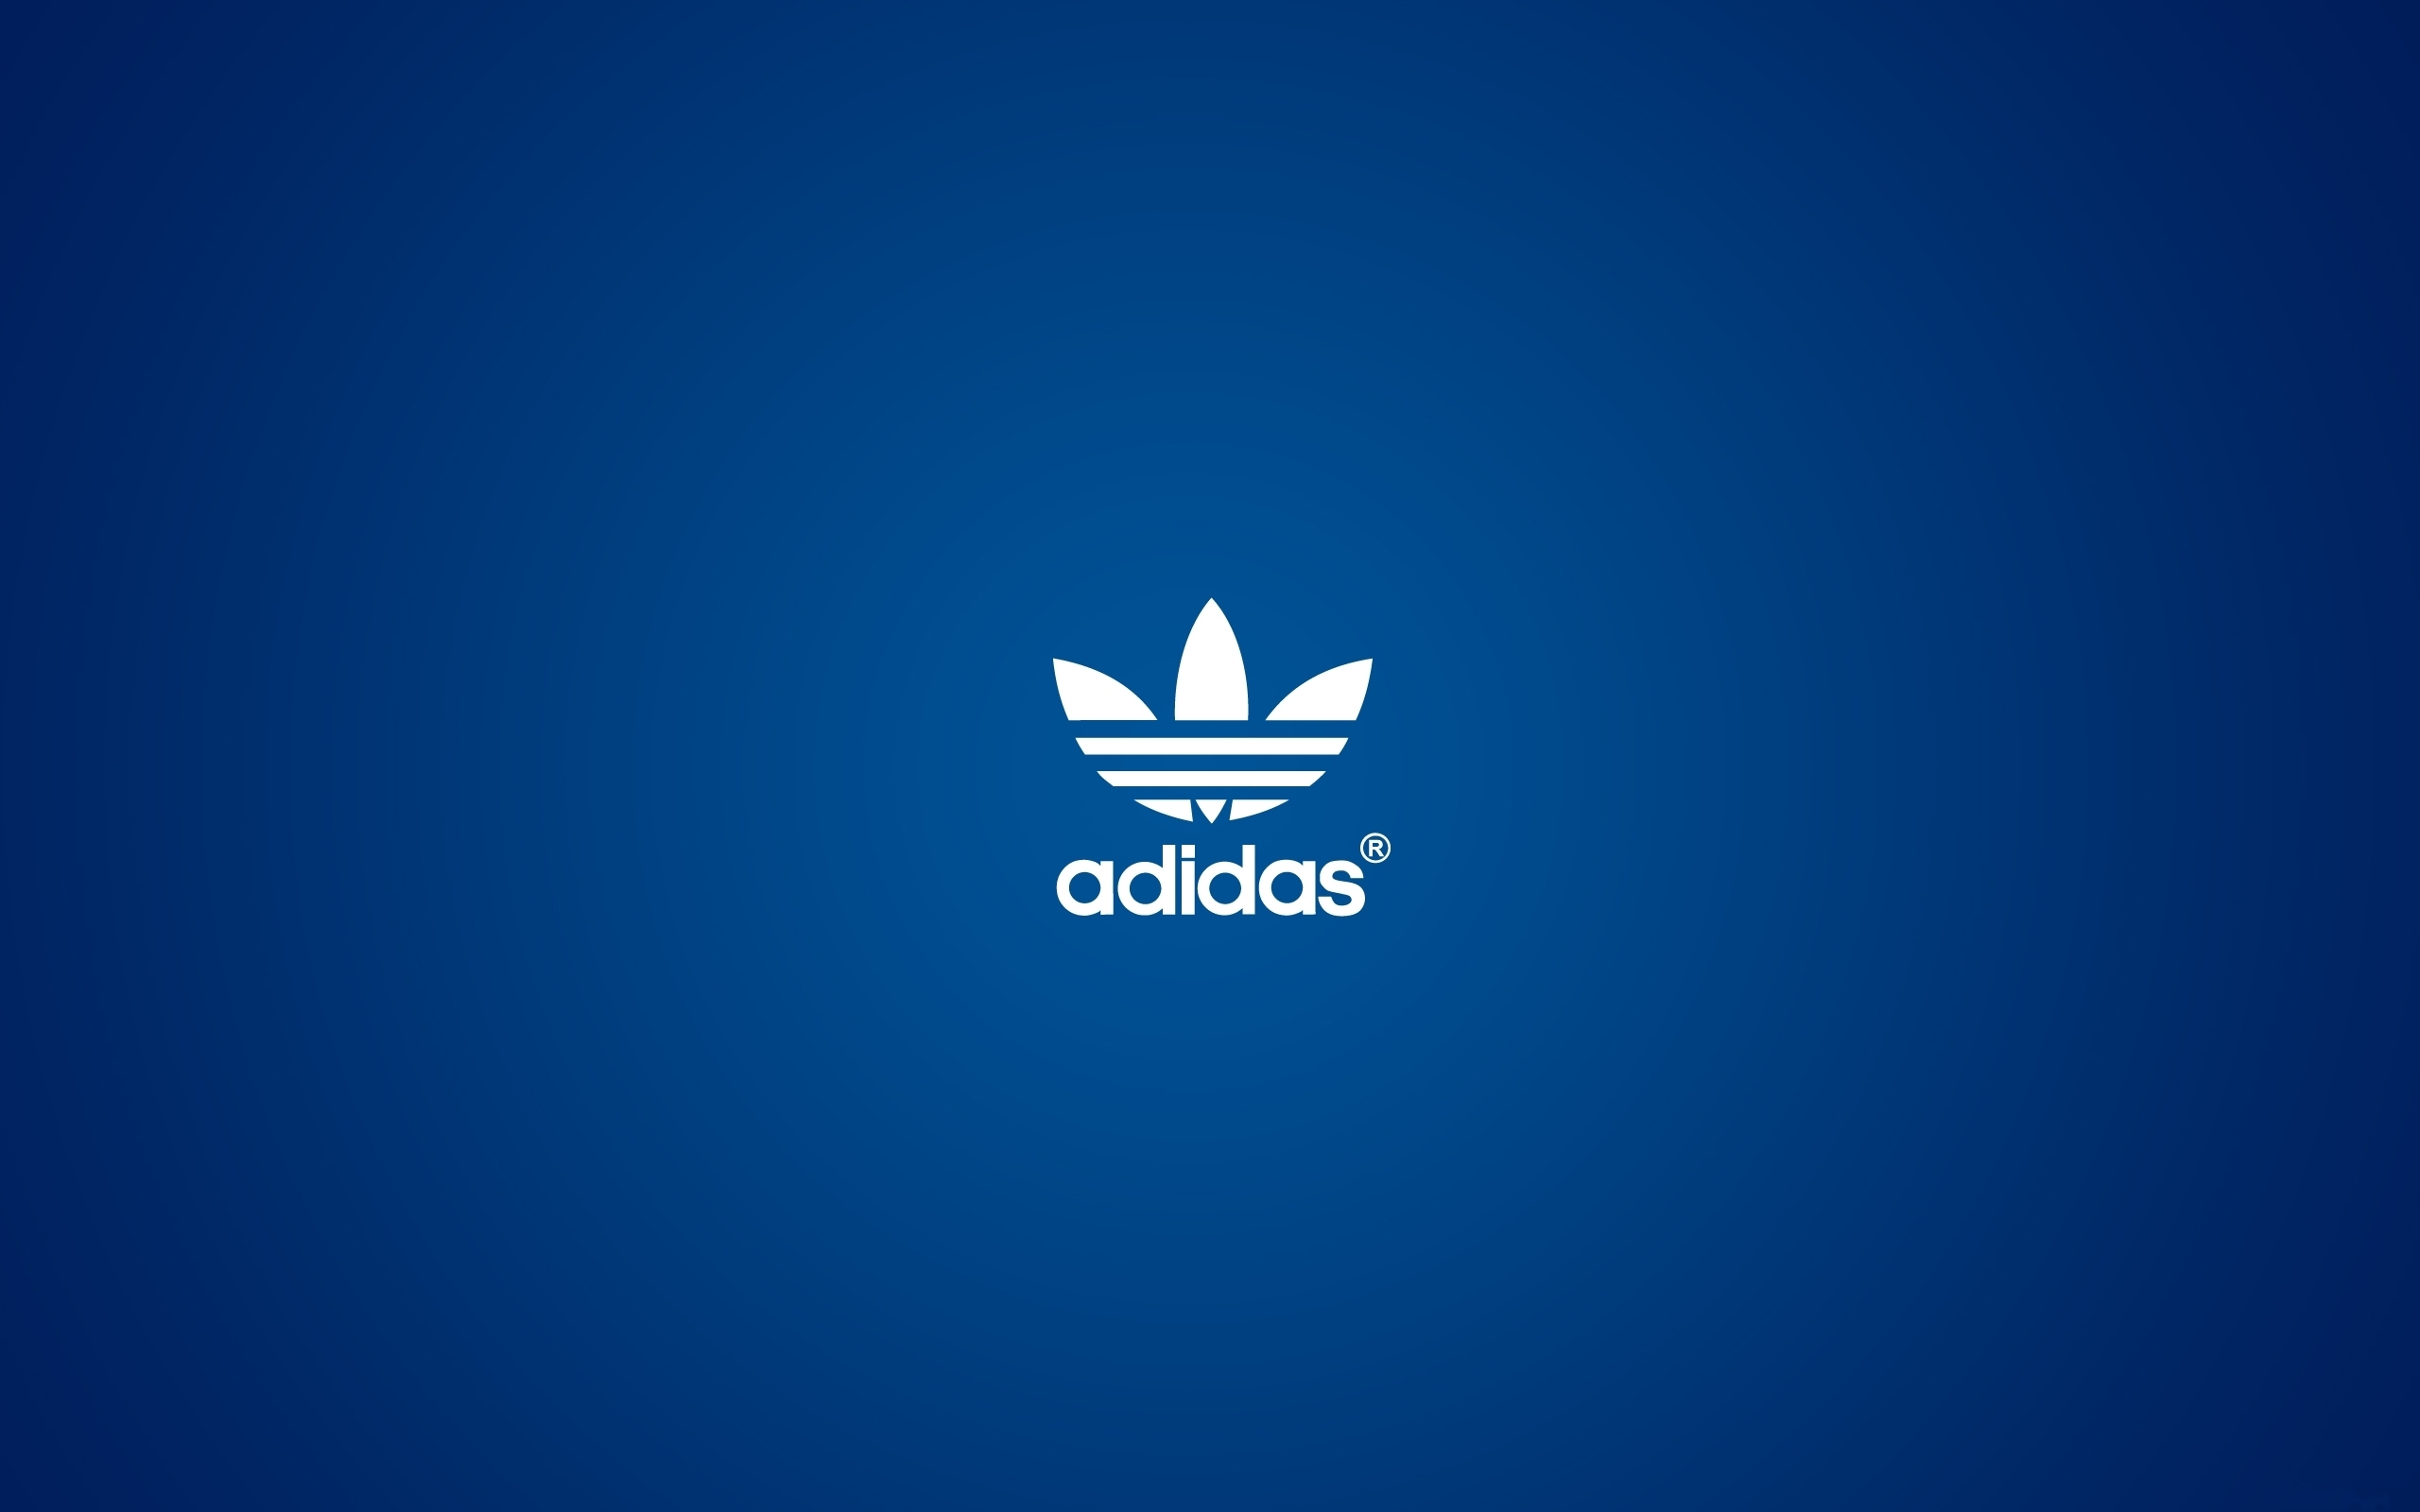 adidas logo wide wallpaper 49269